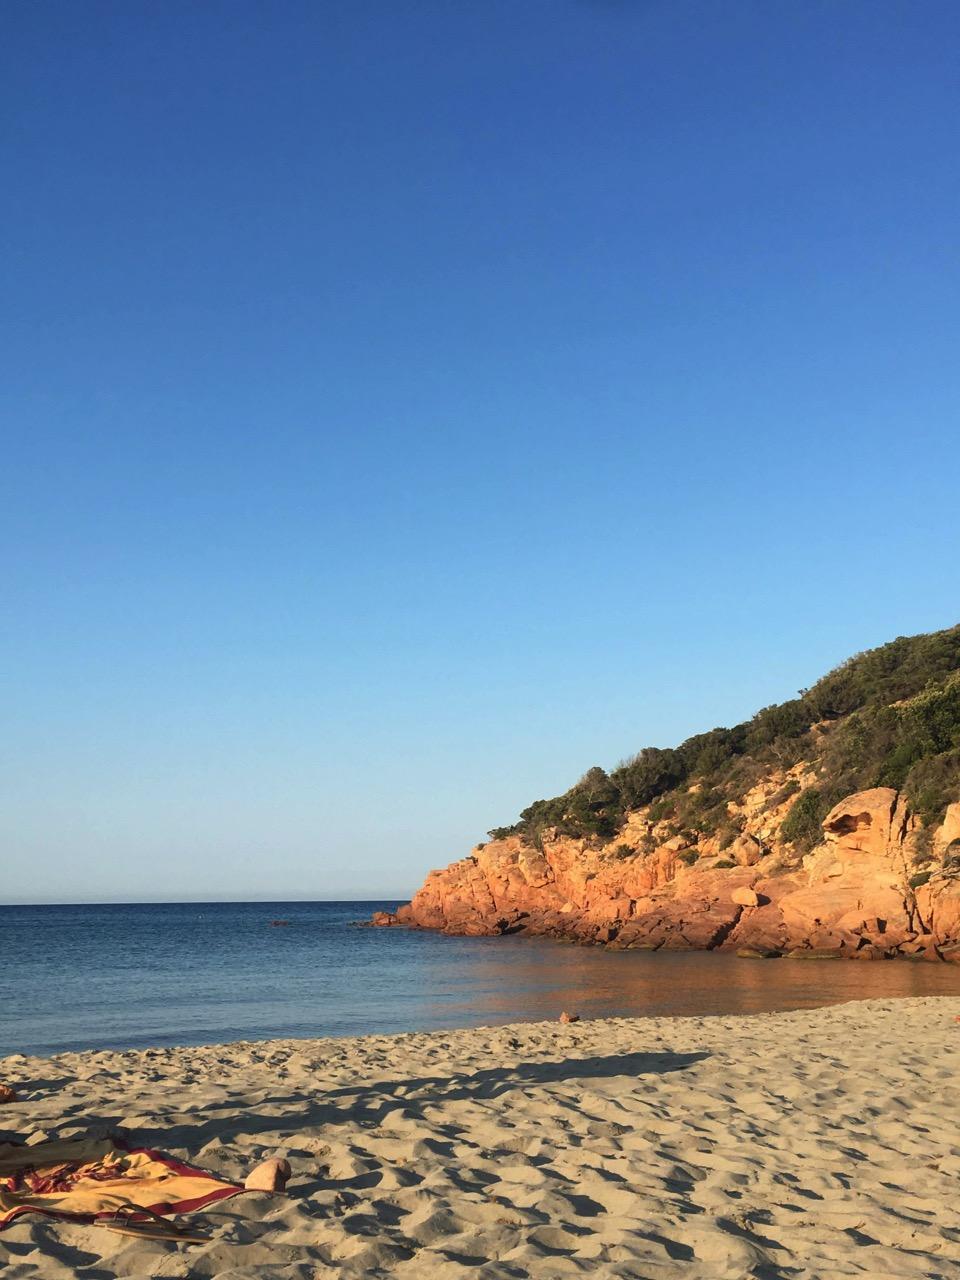 sardaigne paysage mer